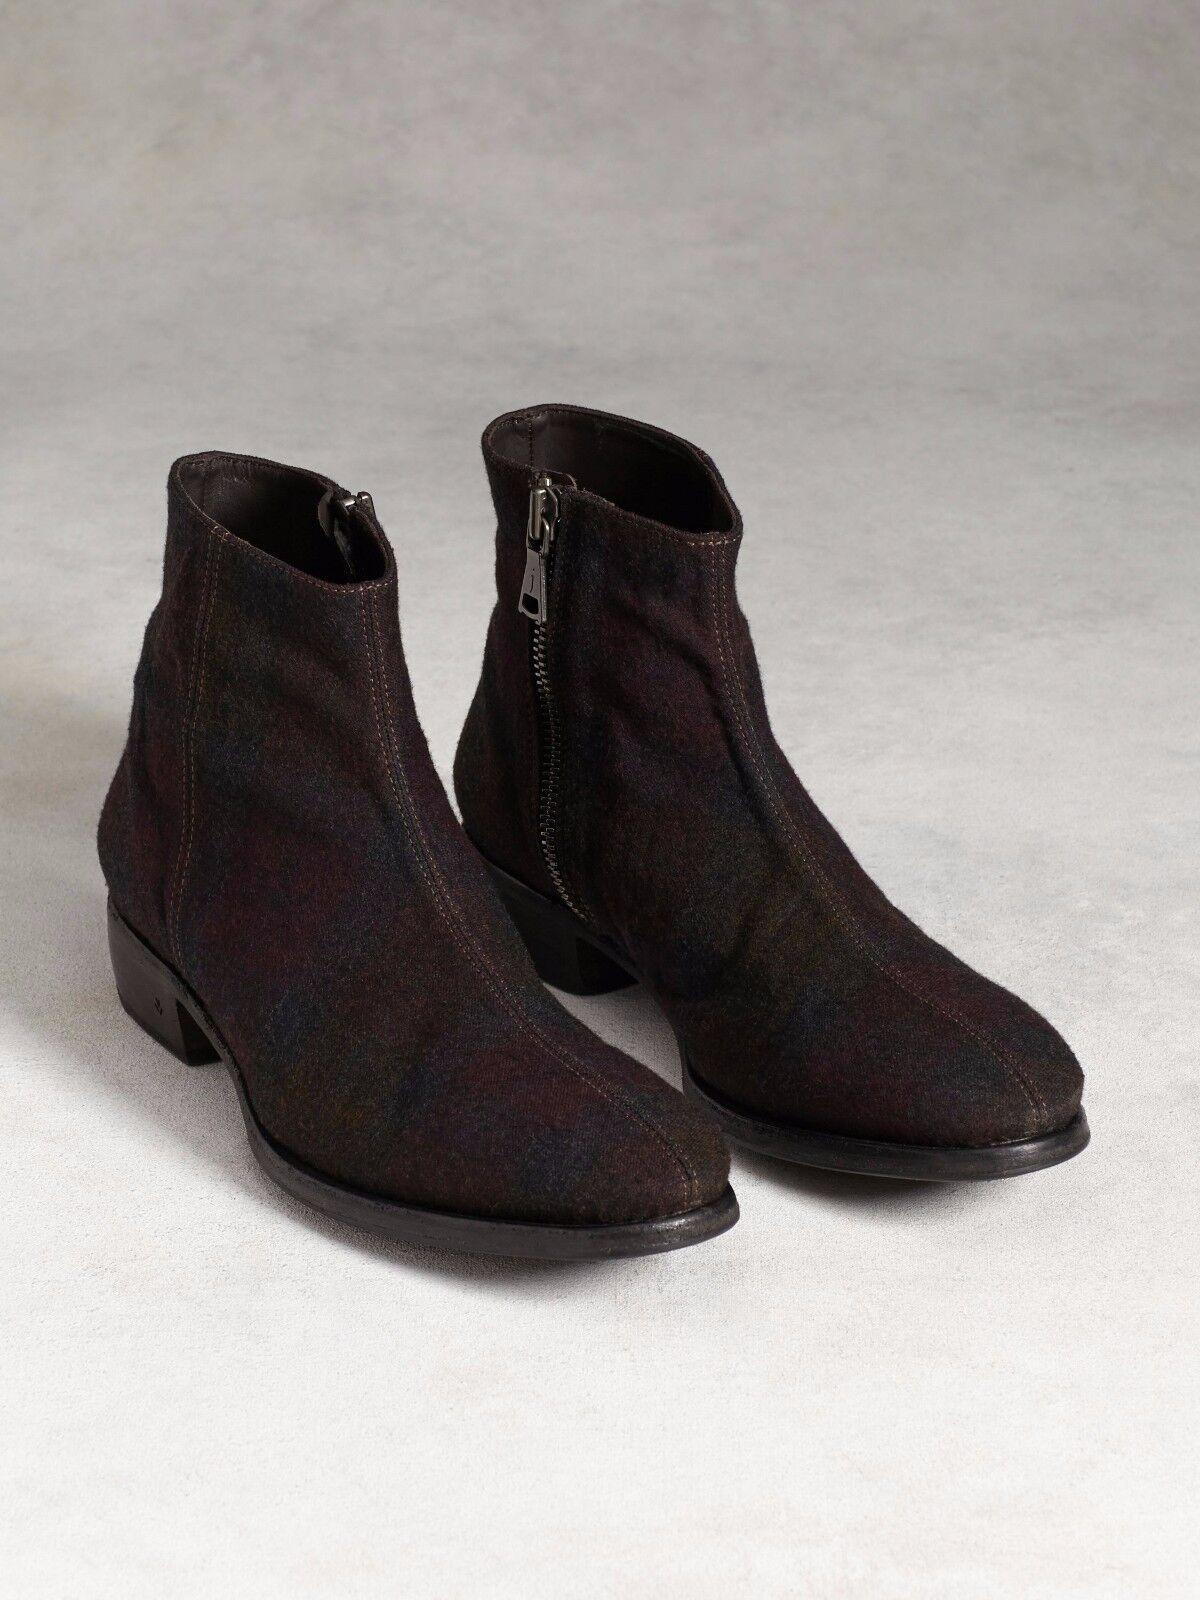 John Varvatos Men's Stitched Wool Ankle Boots, US 12